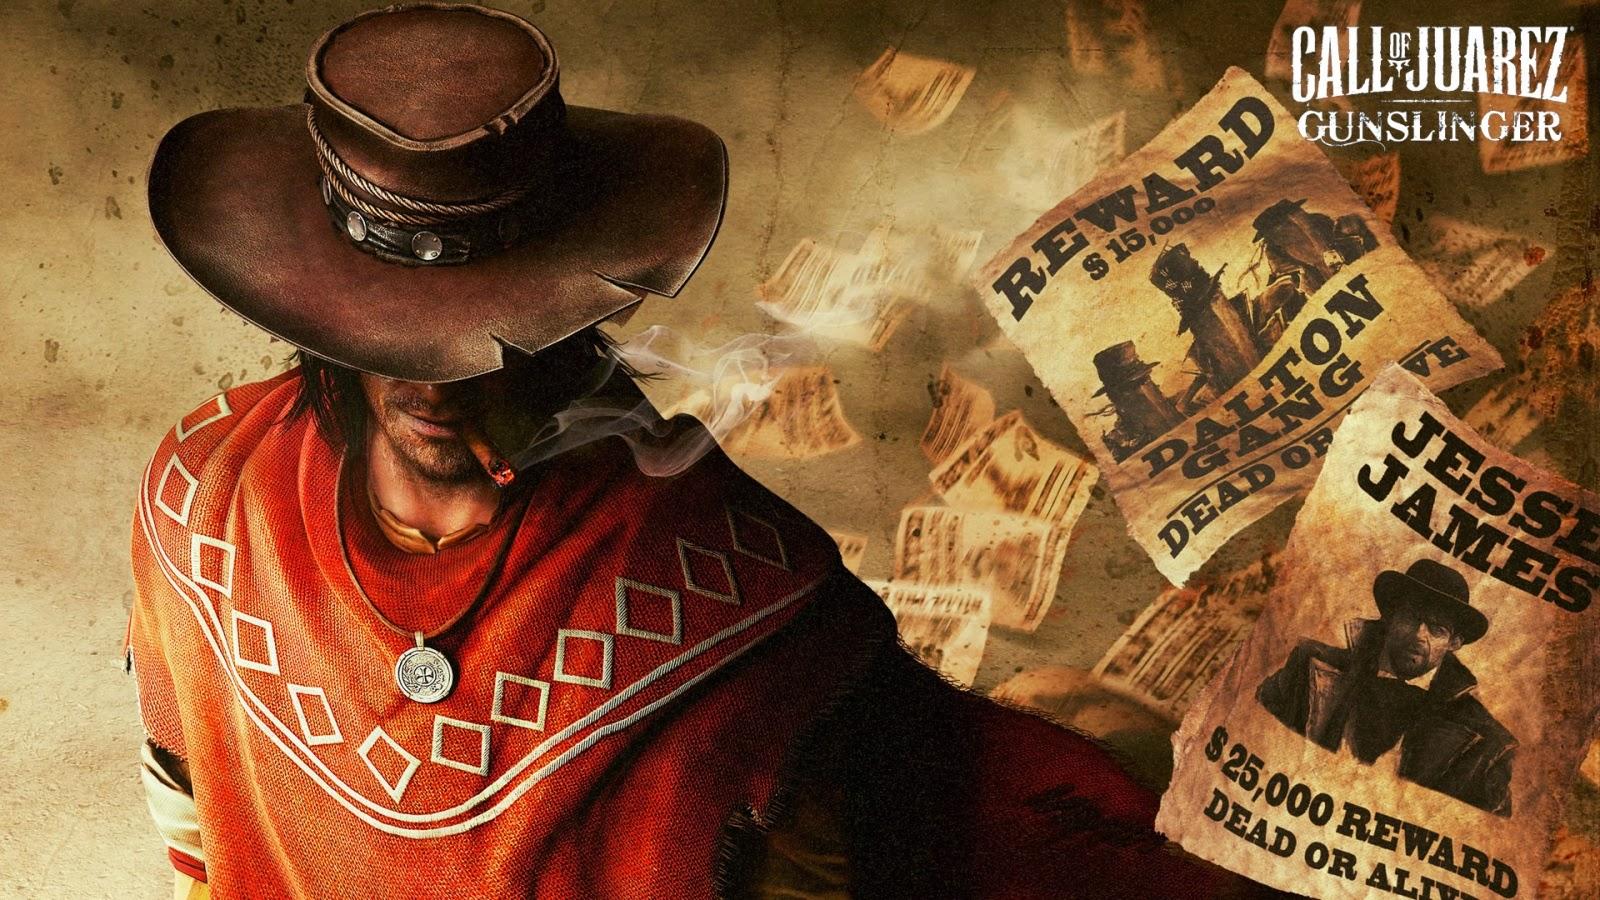 Call of Juarez Gunslinger - free direct download